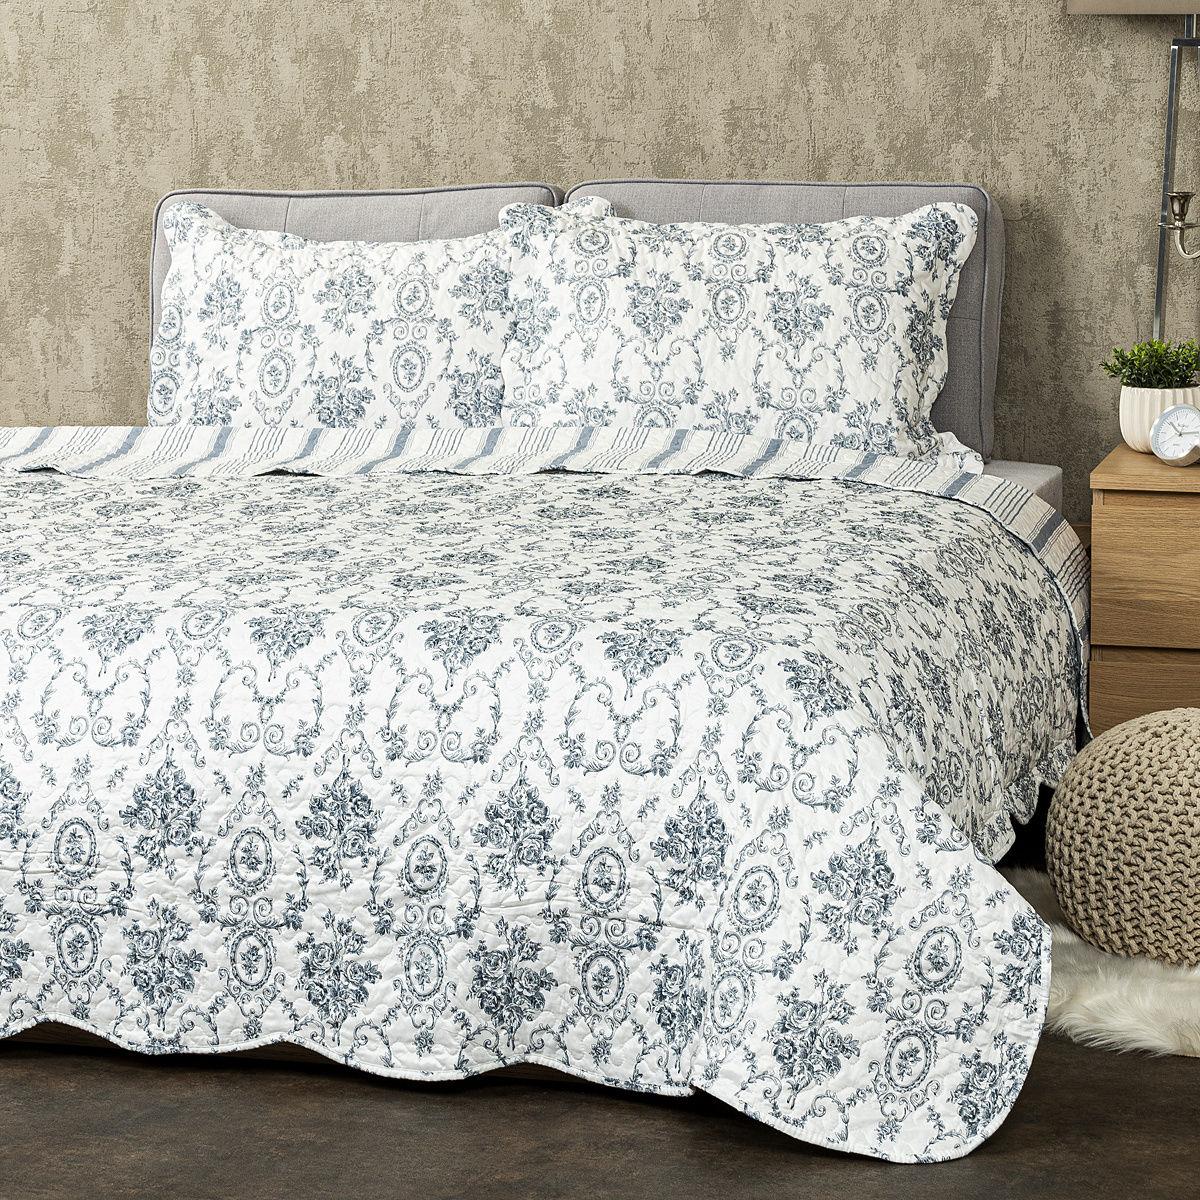 4Home Narzuta na łóżko Blue Patrones